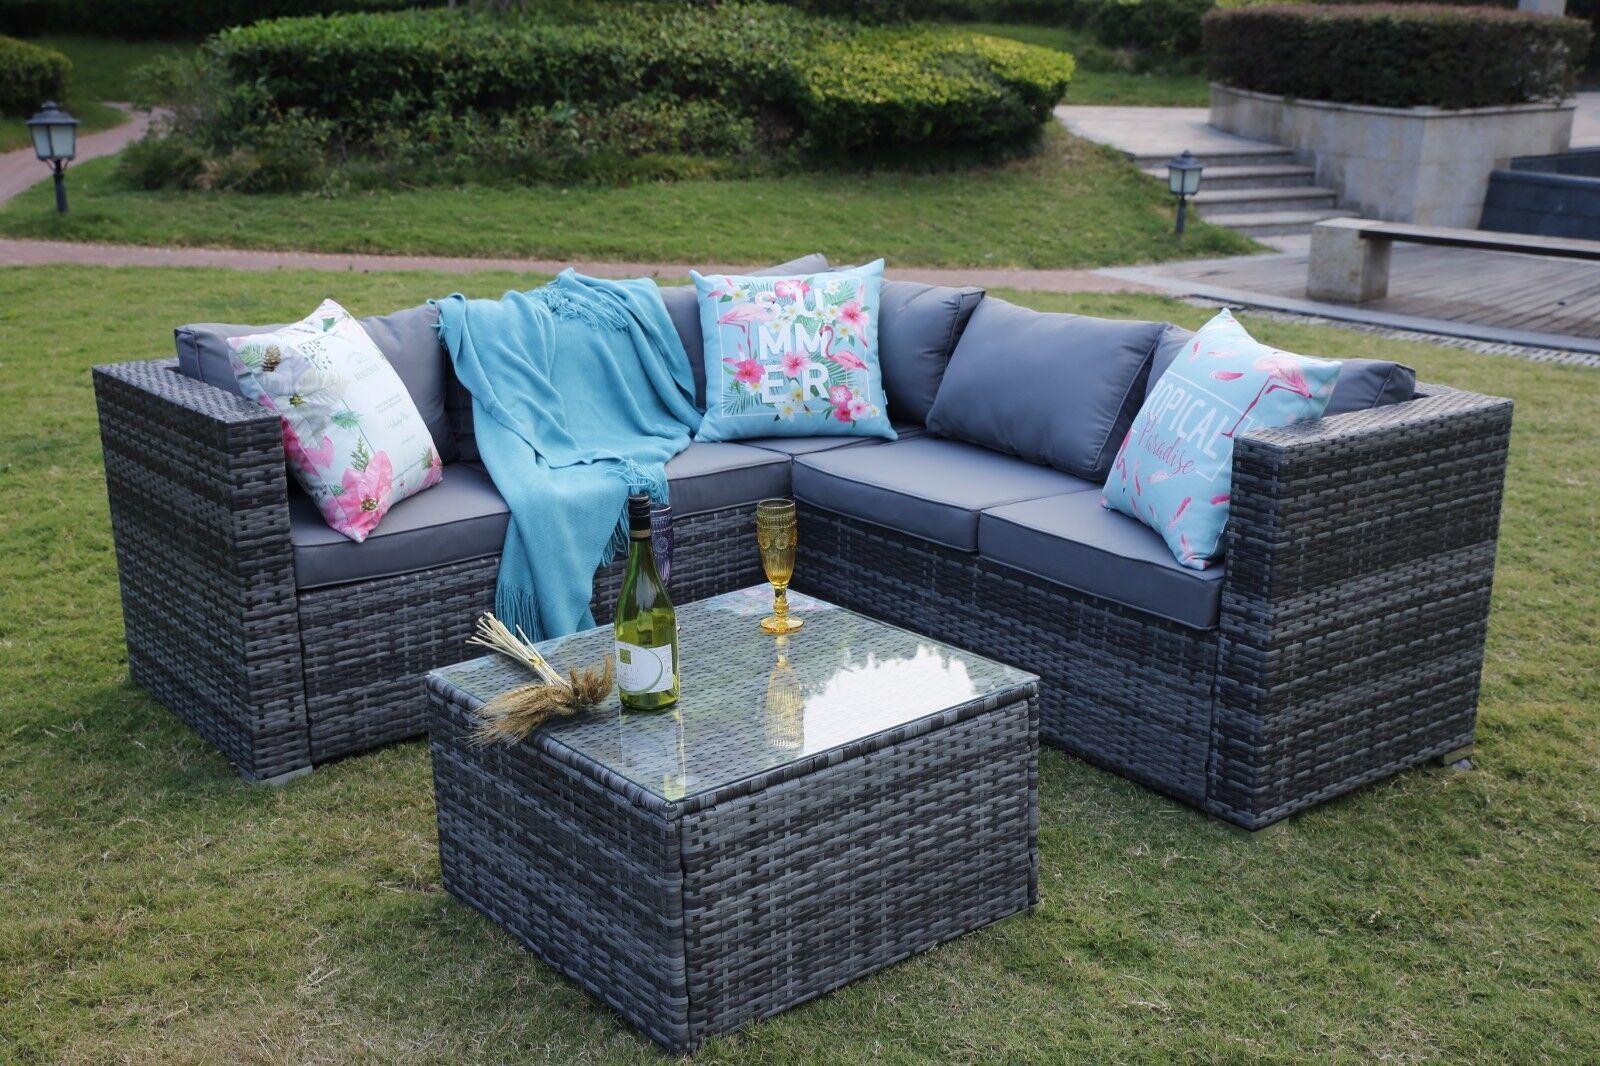 Garden Furniture - Rattan Garden Furniture Set 5 Seater Corner Sofa Set Patio Conservatory Grey